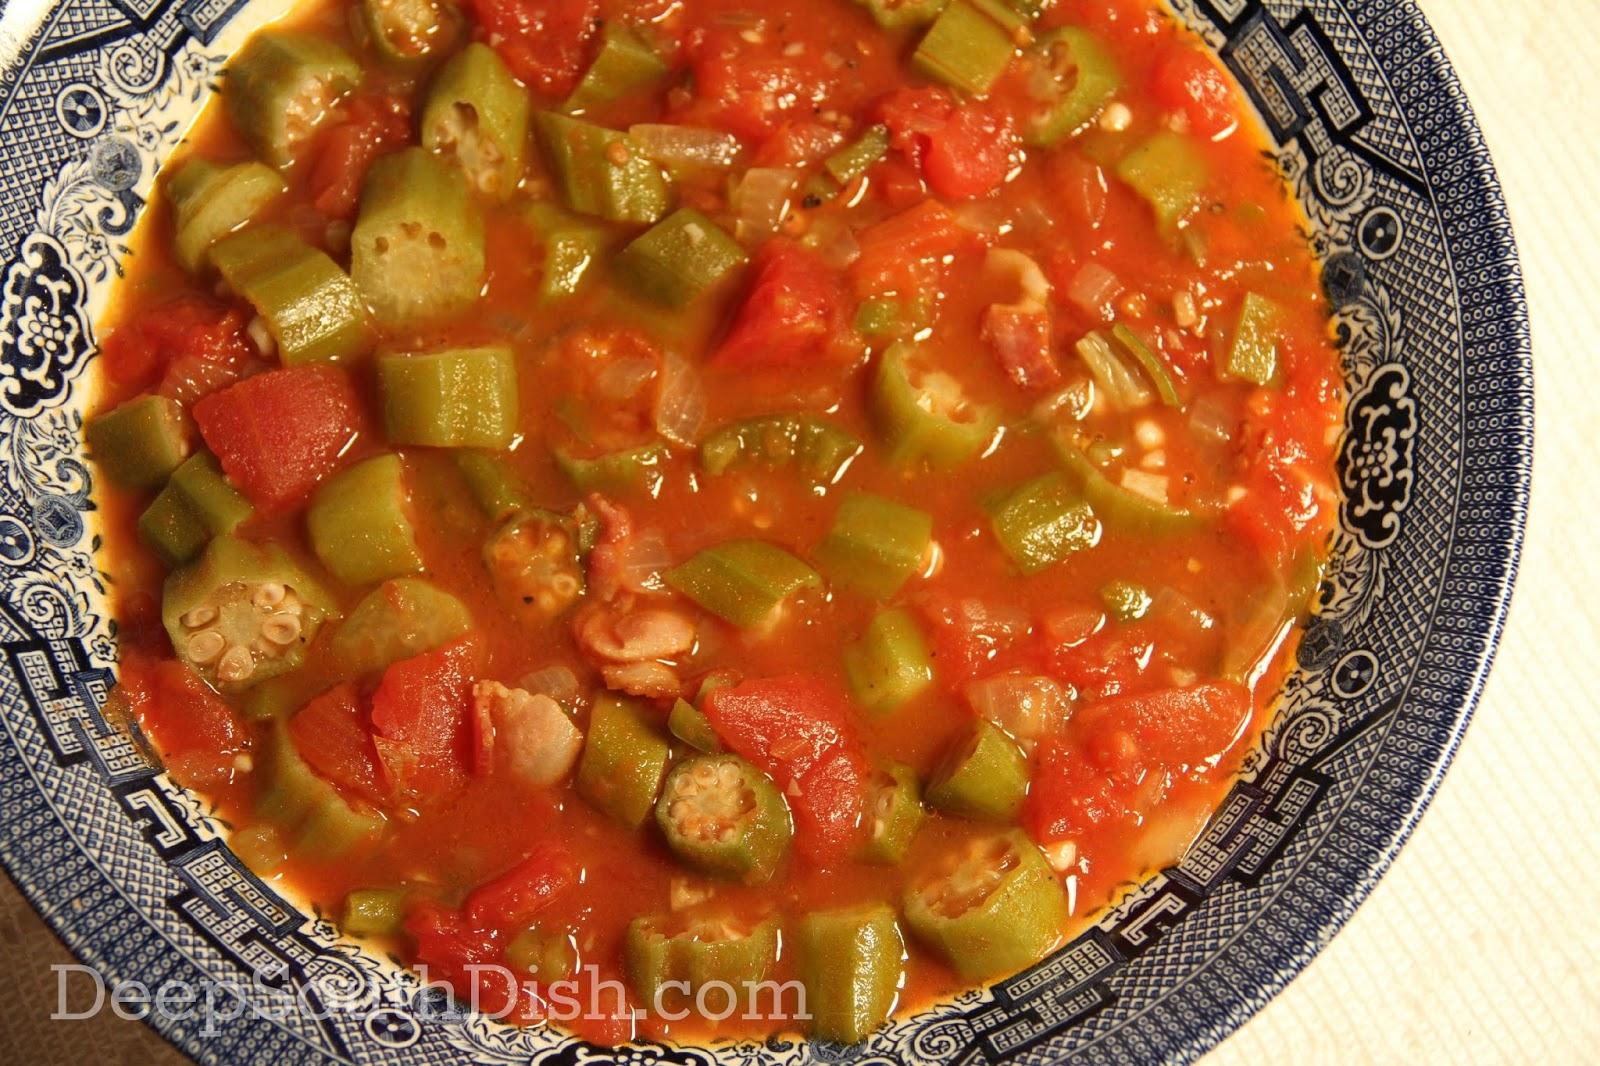 Deep South Dish: Steamed Okra